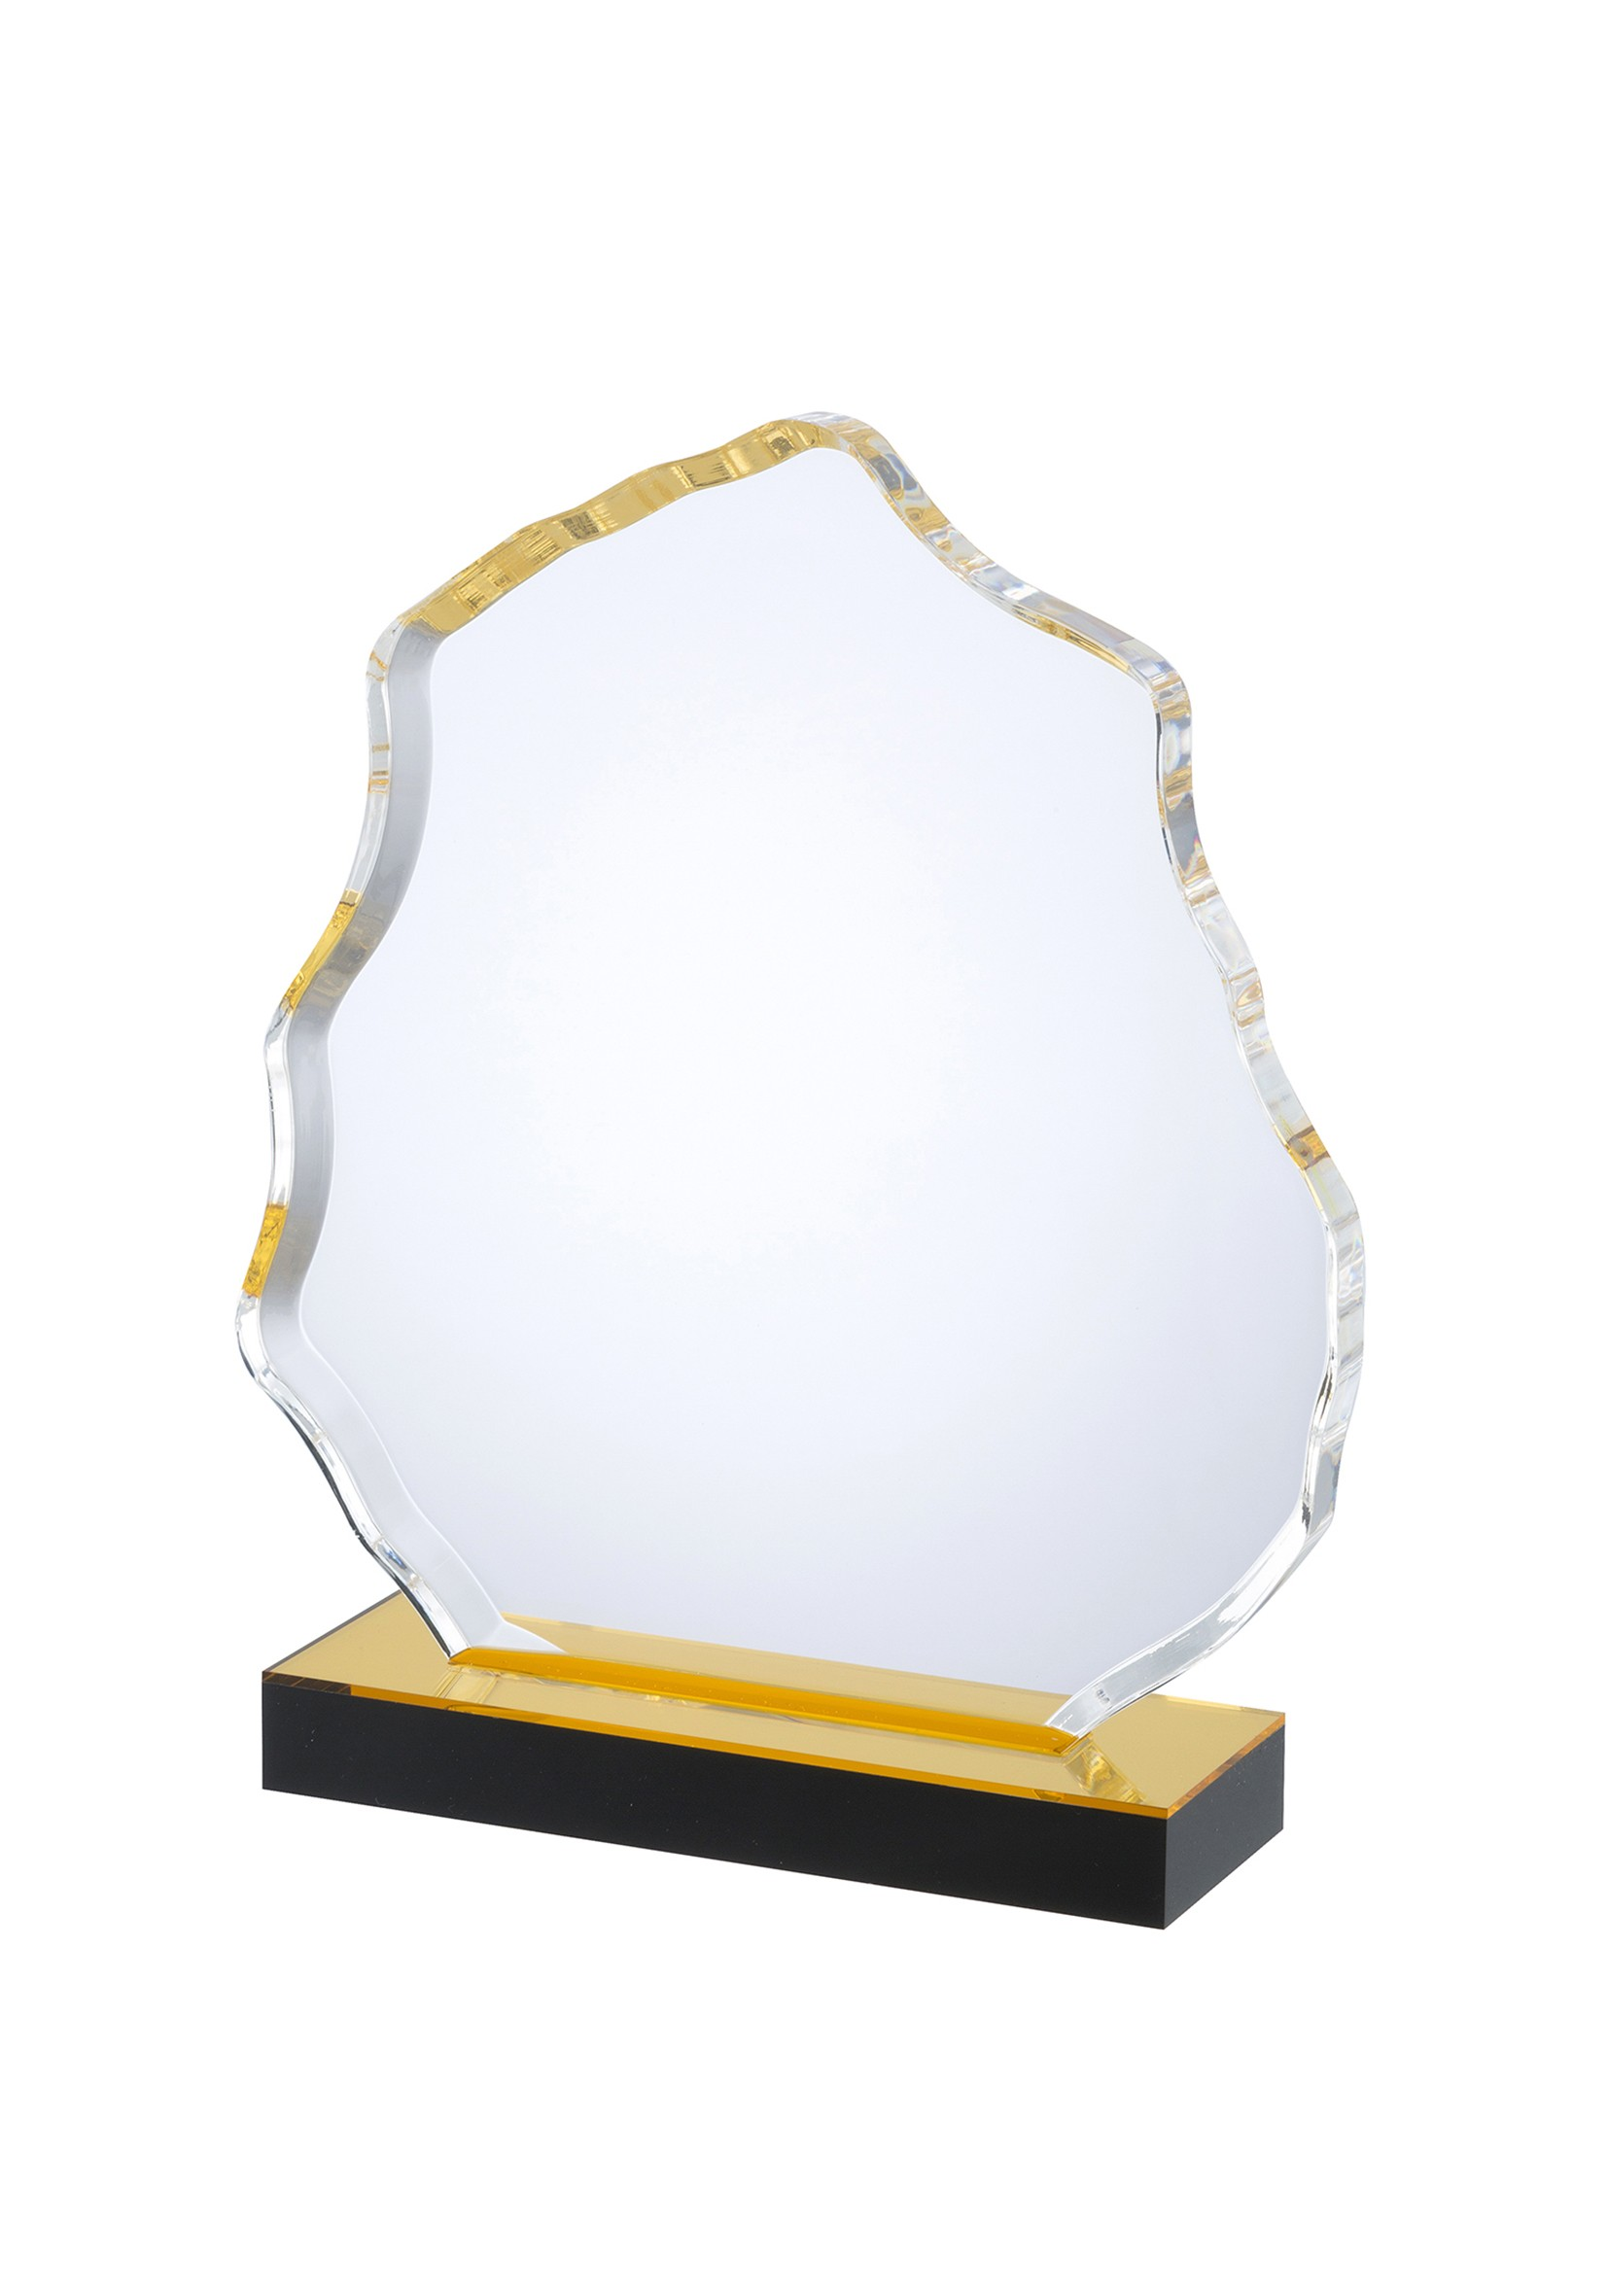 LG Acrylic Award